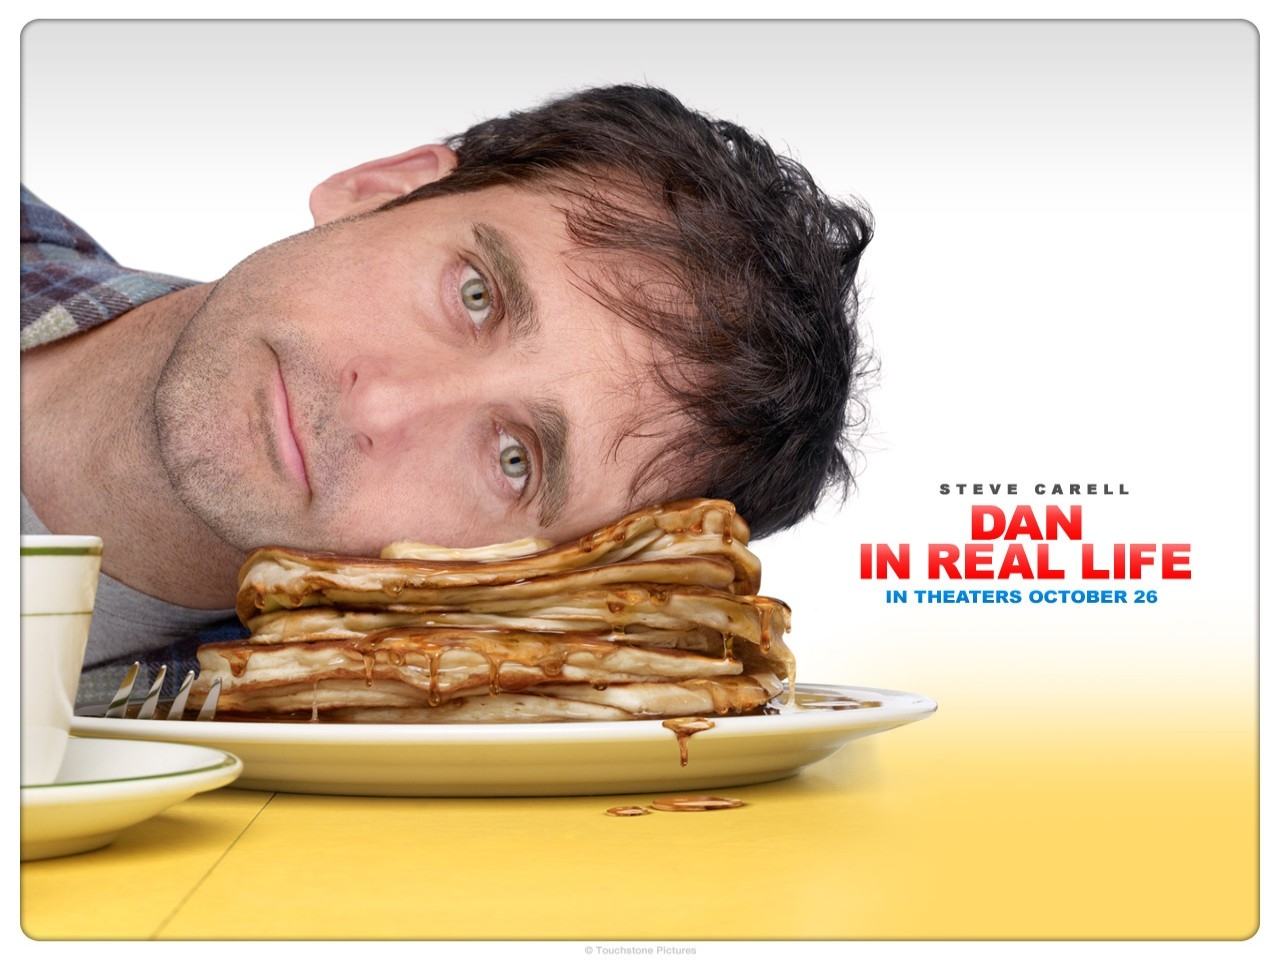 Wallpaper del film L'amore secondo Dan con Steve Carell